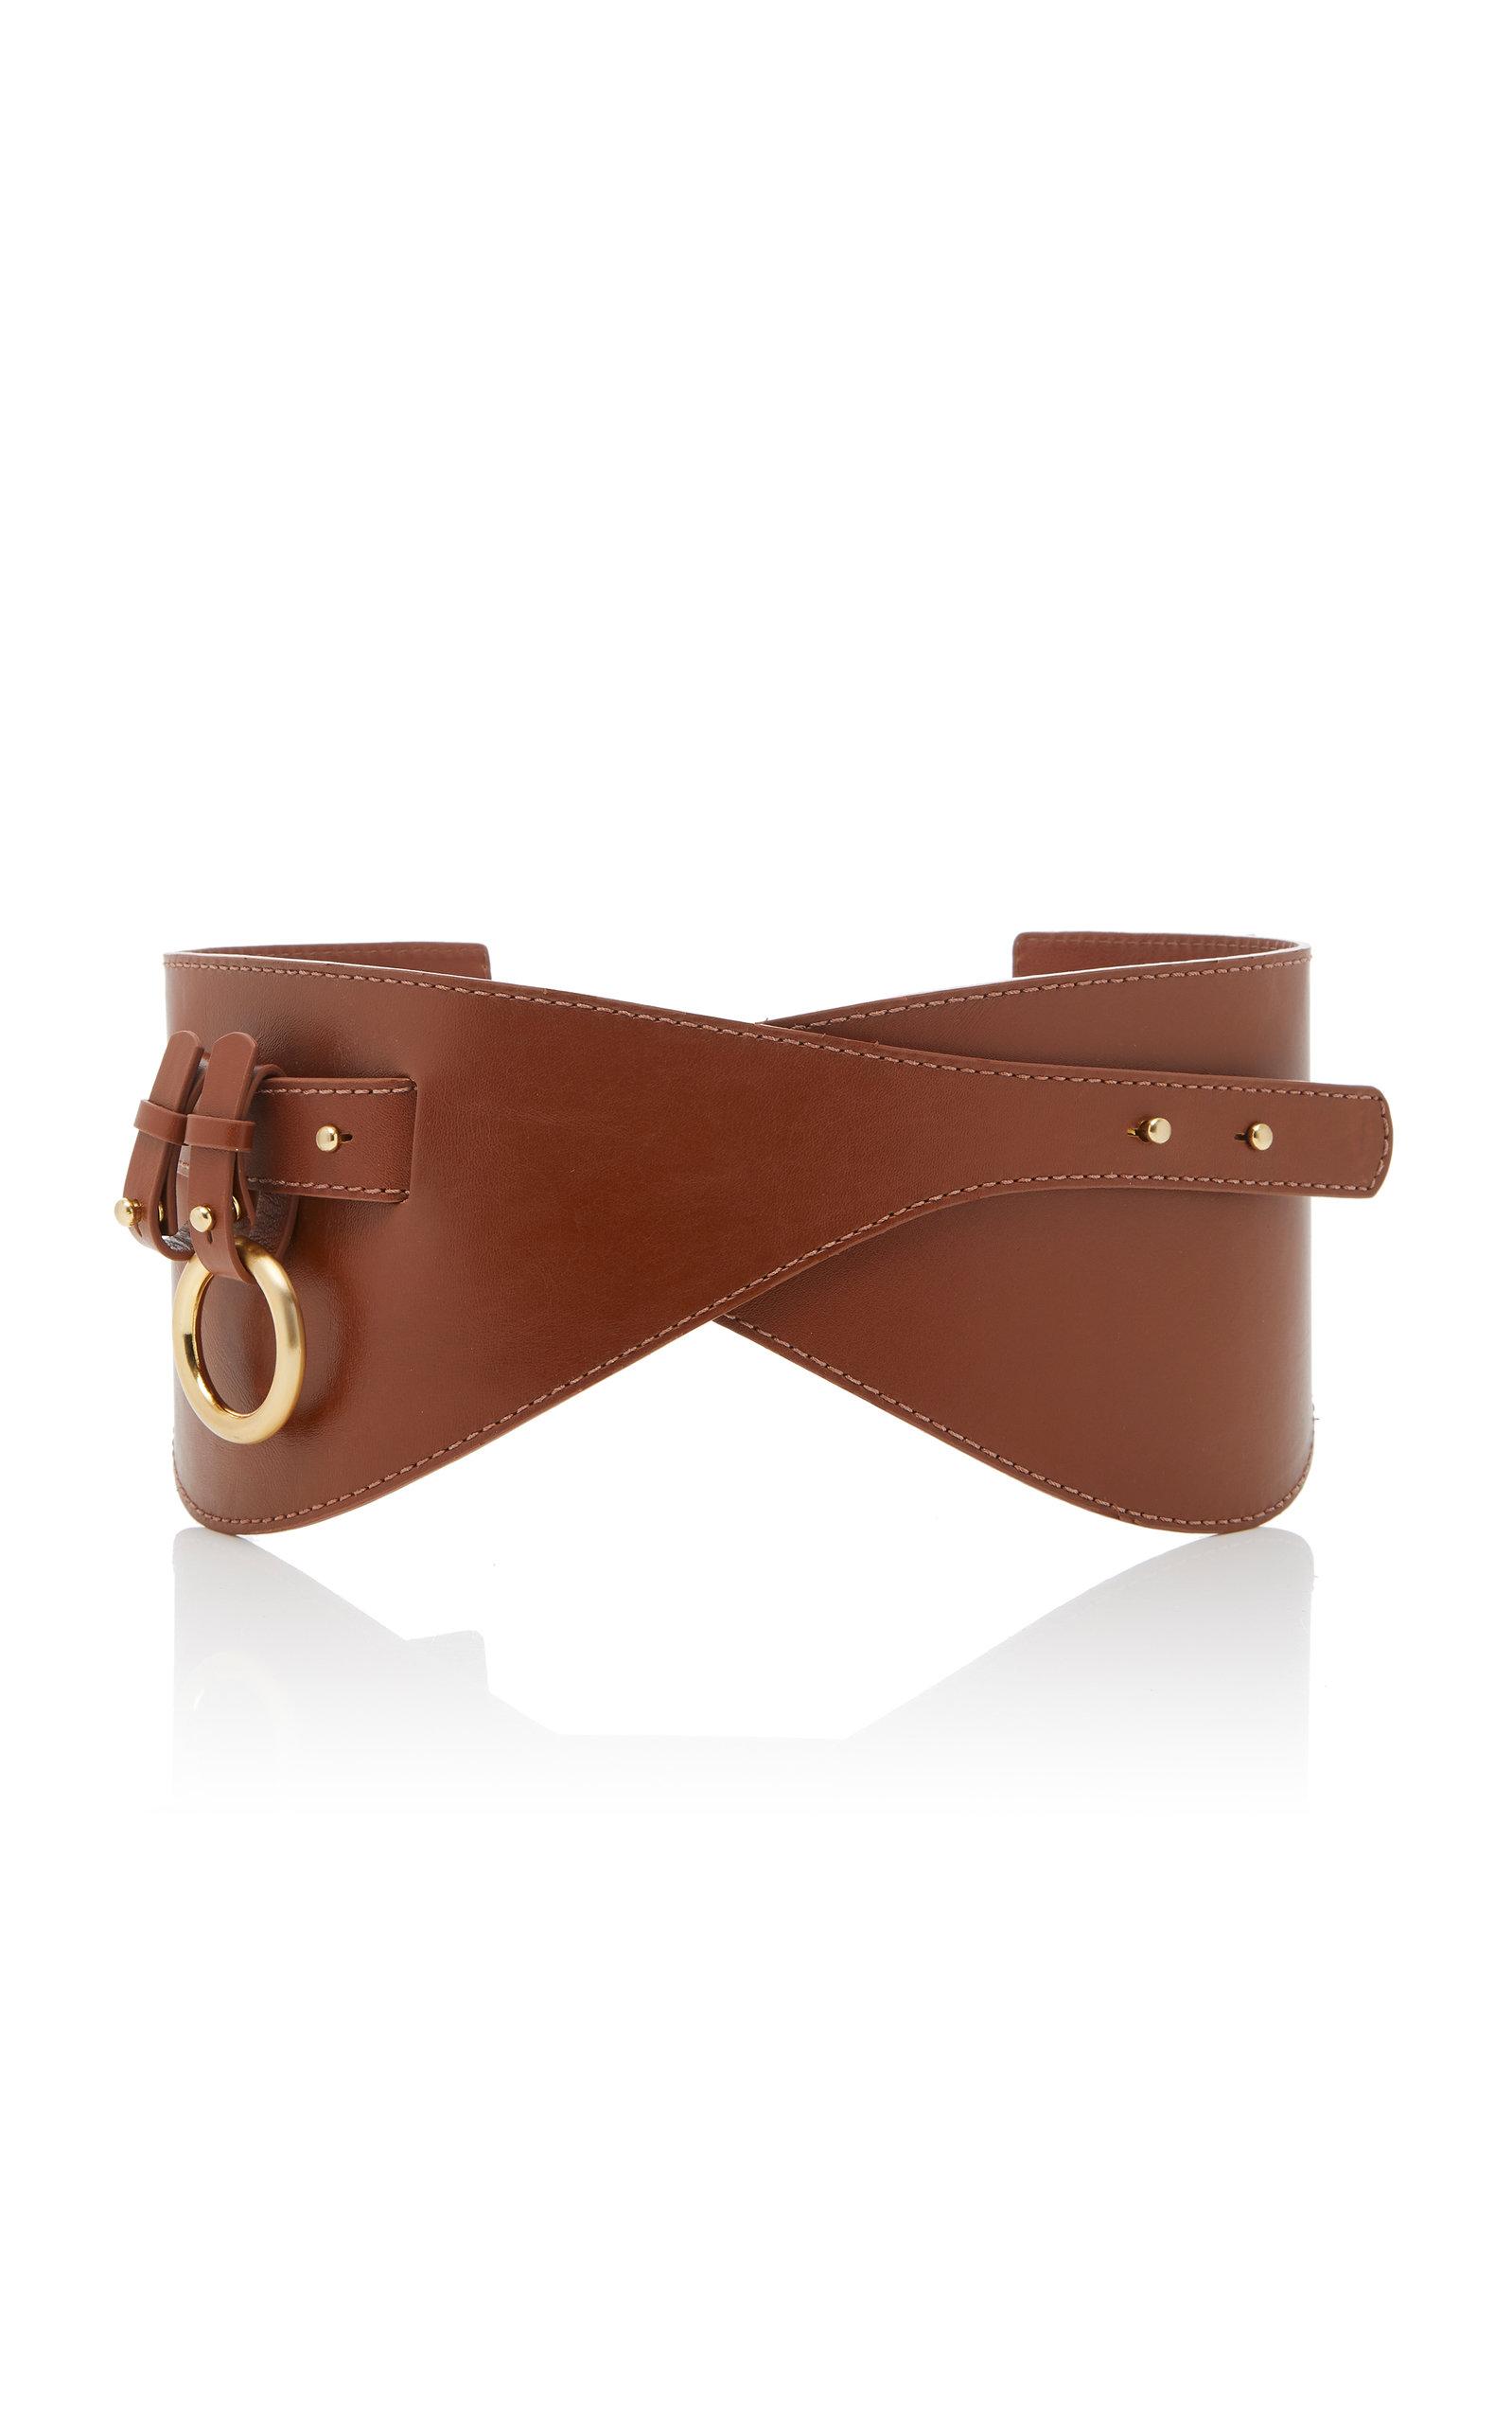 Small Leather Goods - Belts Zimmermann tJS5PTk8ly